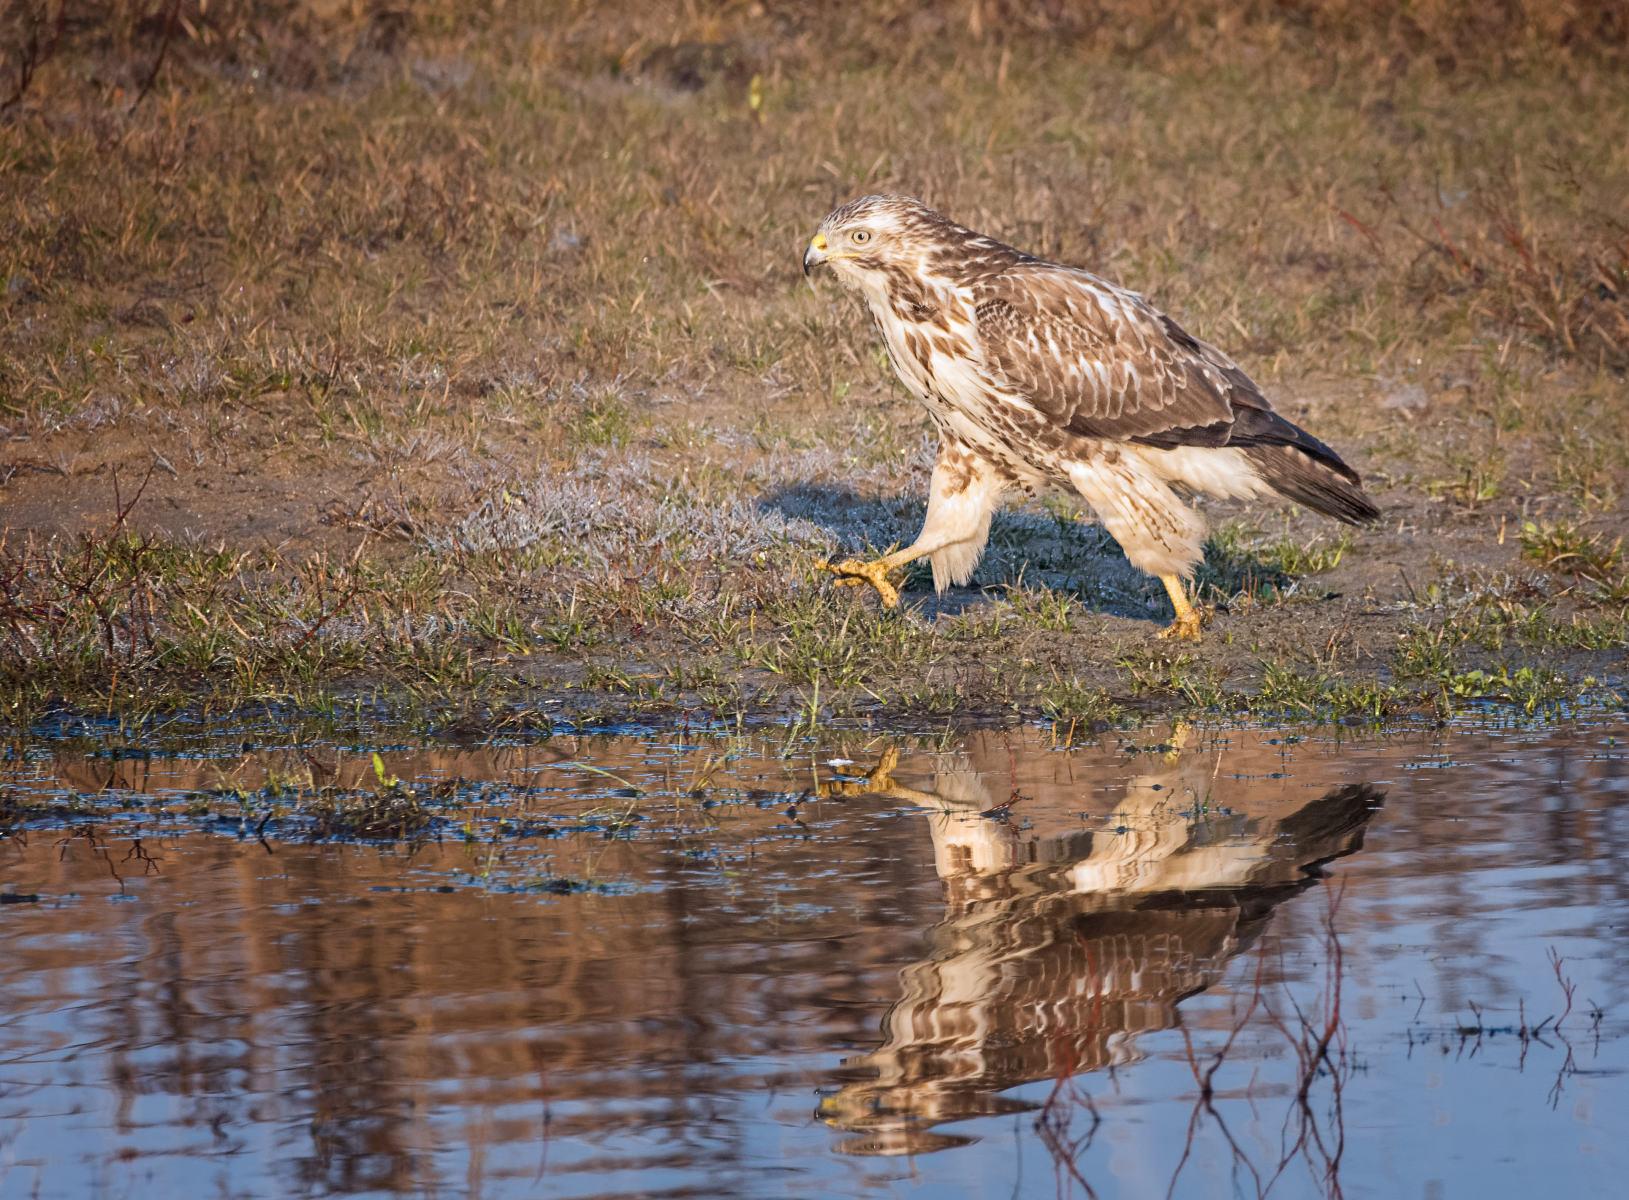 common buzzard striding along edge of pond